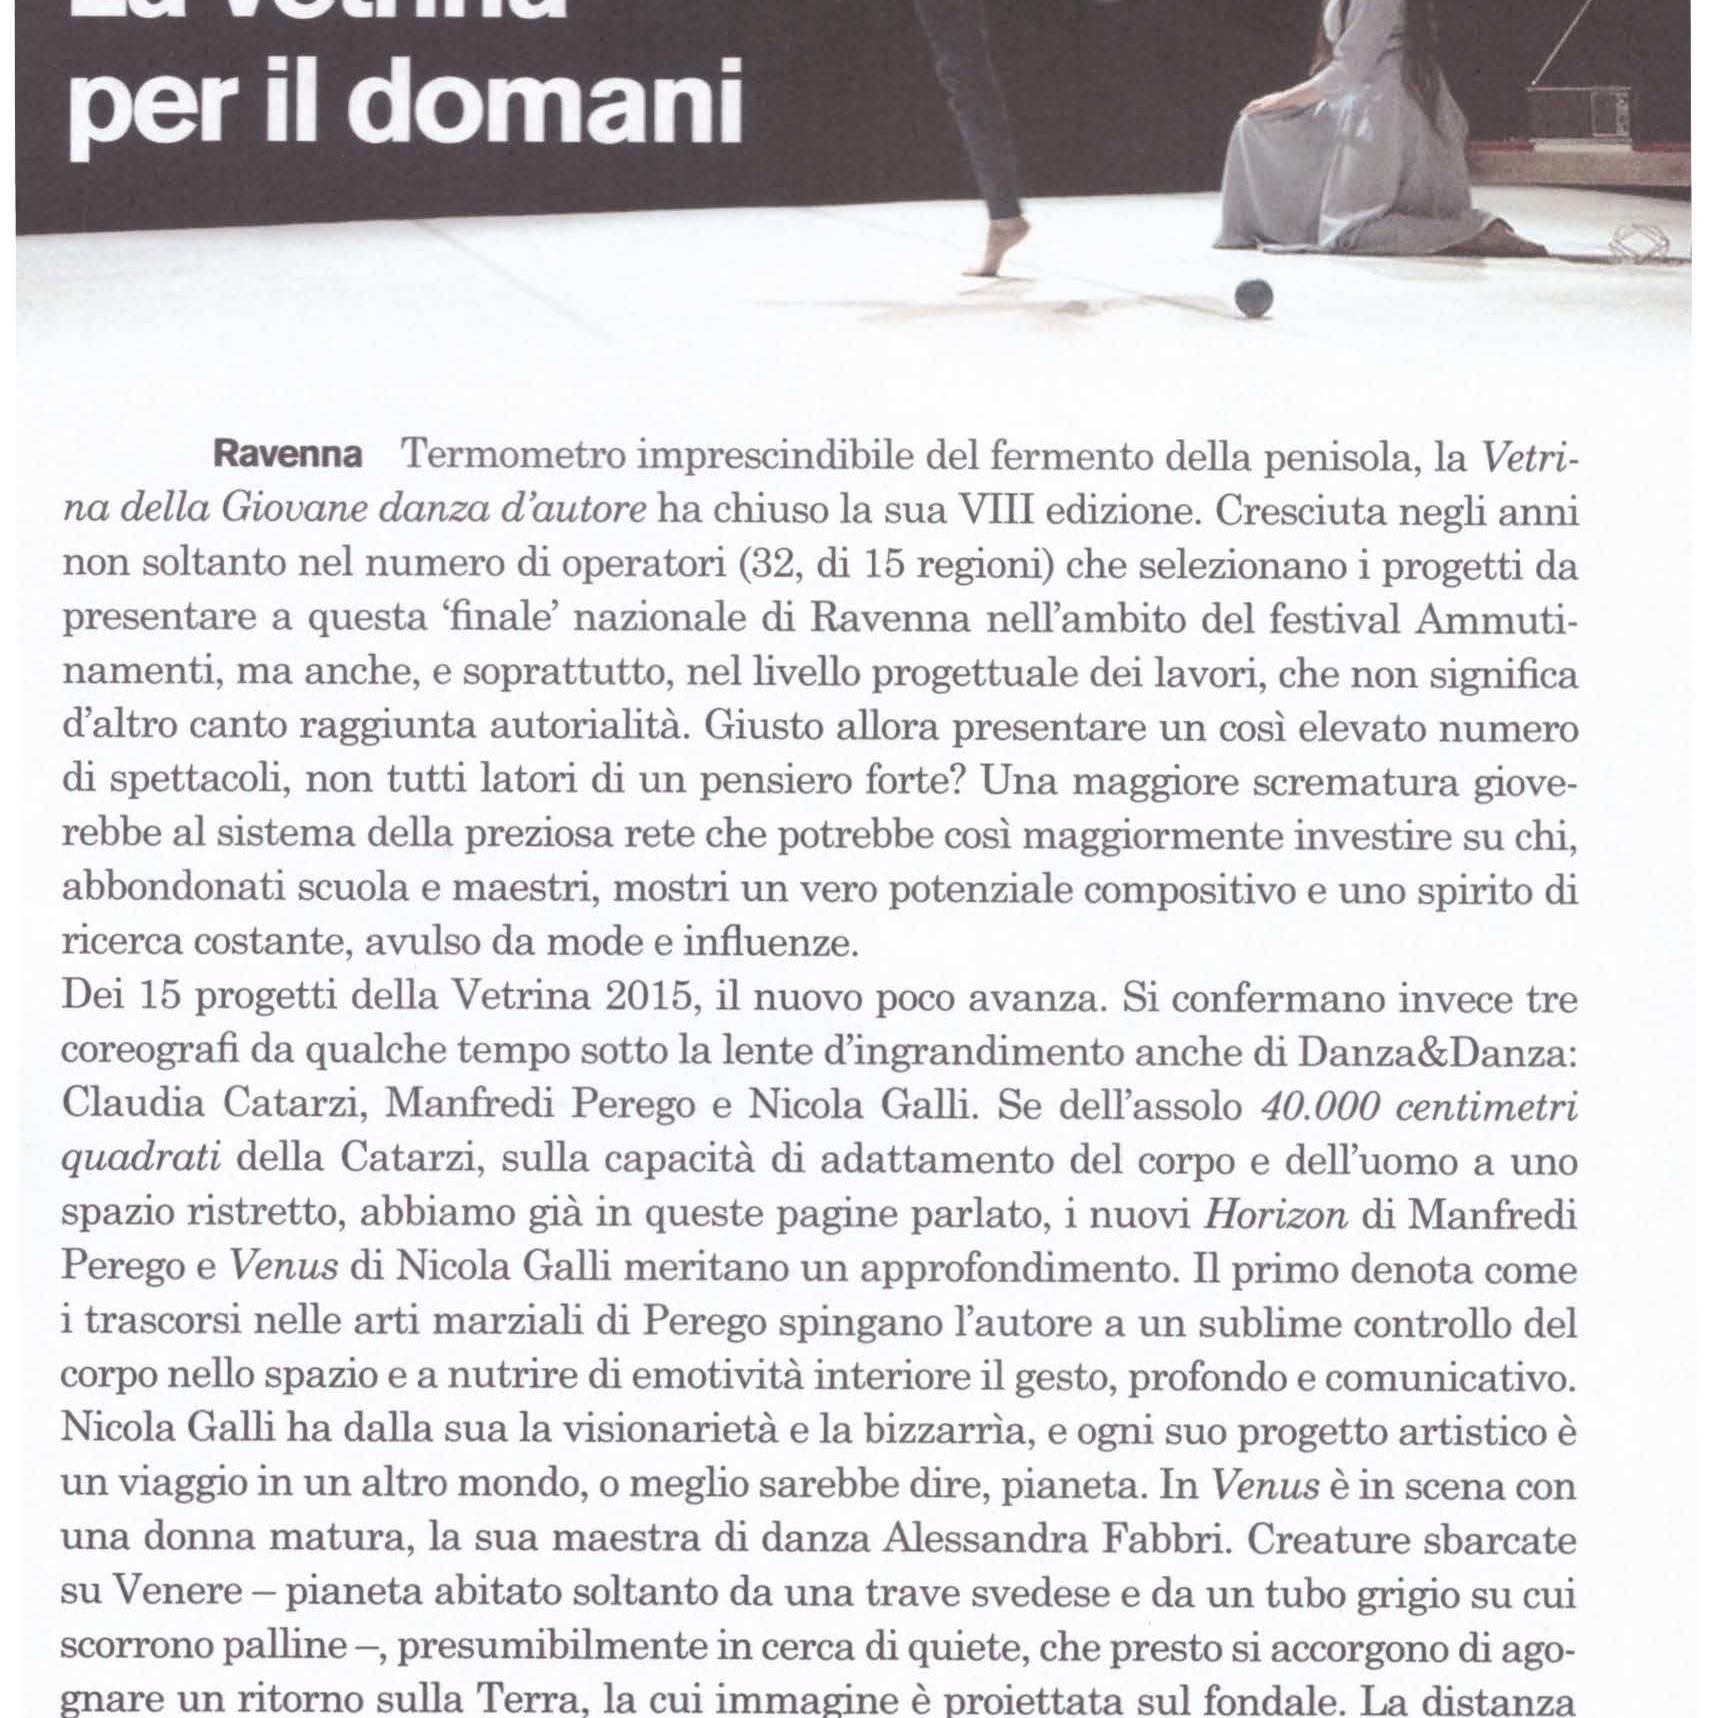 Nicola Galli Venus / Manfredi Perego - Horizon / Danza_e_danza Maria Luisa Buzzi_2015